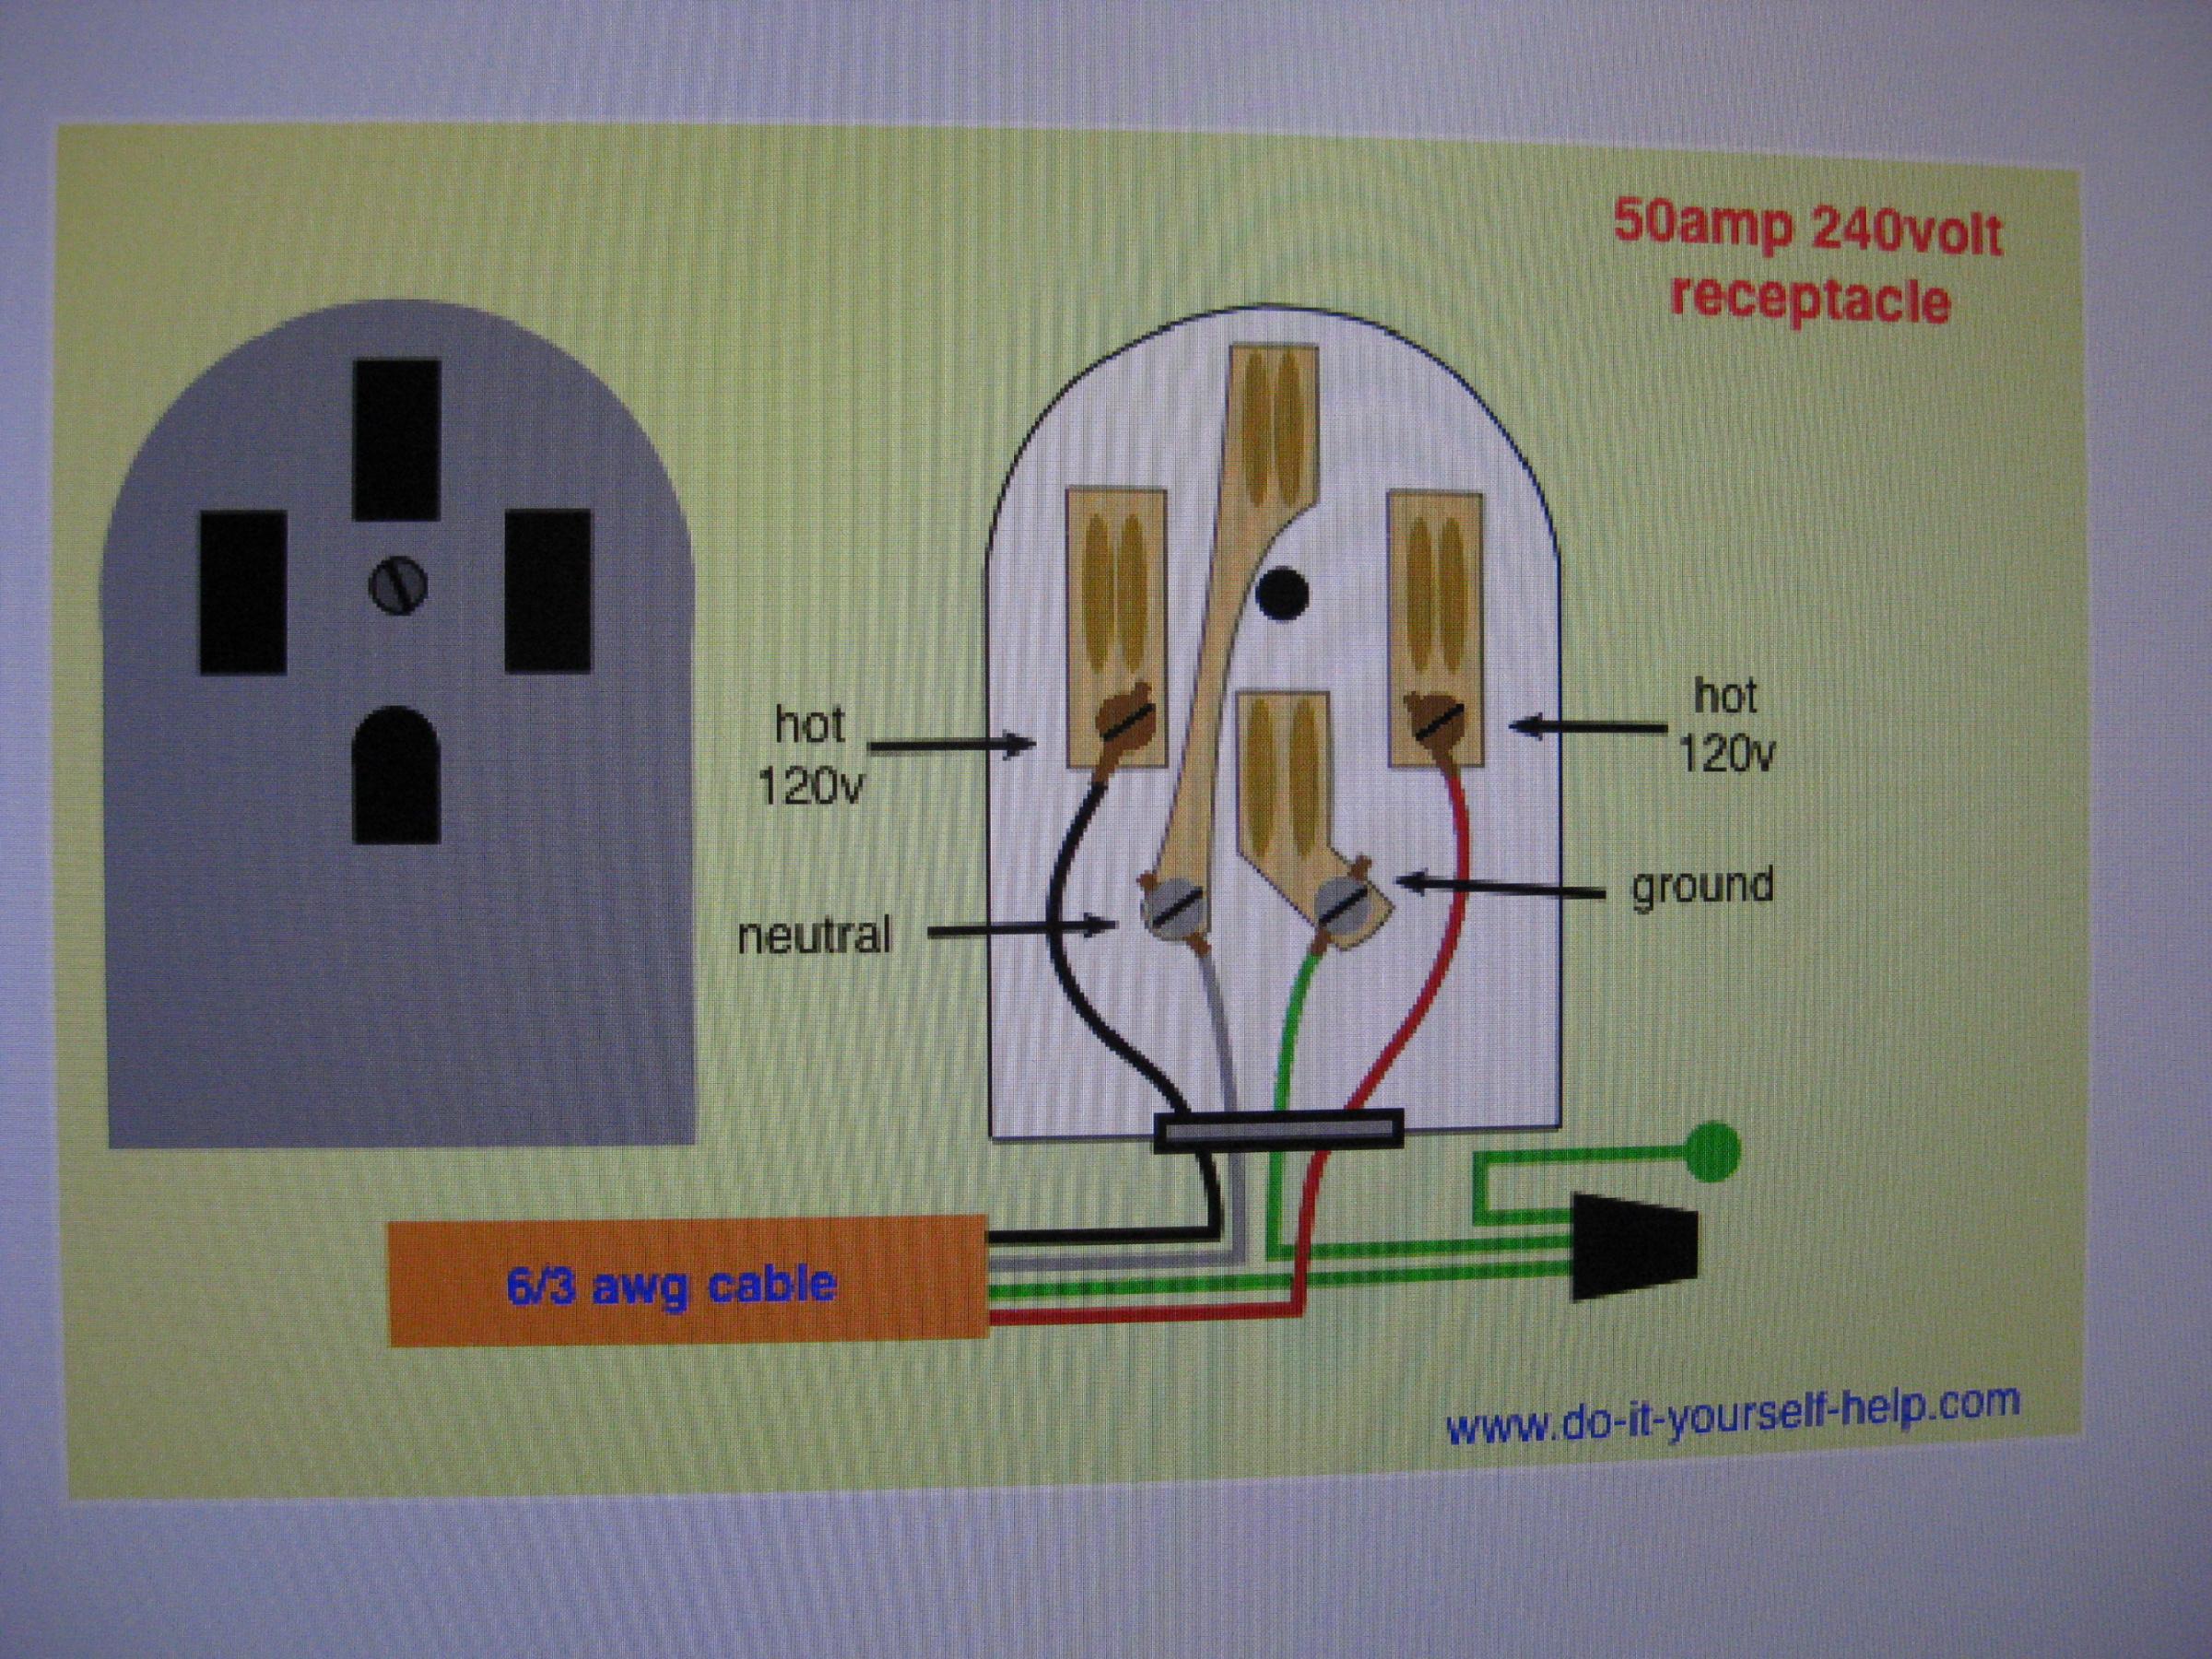 580553d1577071906t-rv-receptacle-question-img_4926  Amp Welder Plug Wiring Diagram on rv generator, round rv power plug, gfci breaker, locking receptacle rv, rv service box, rv extension cord, rv inverter, trailer receptacle, rv pedestal, welder outlet, welding receptacle, rv power,